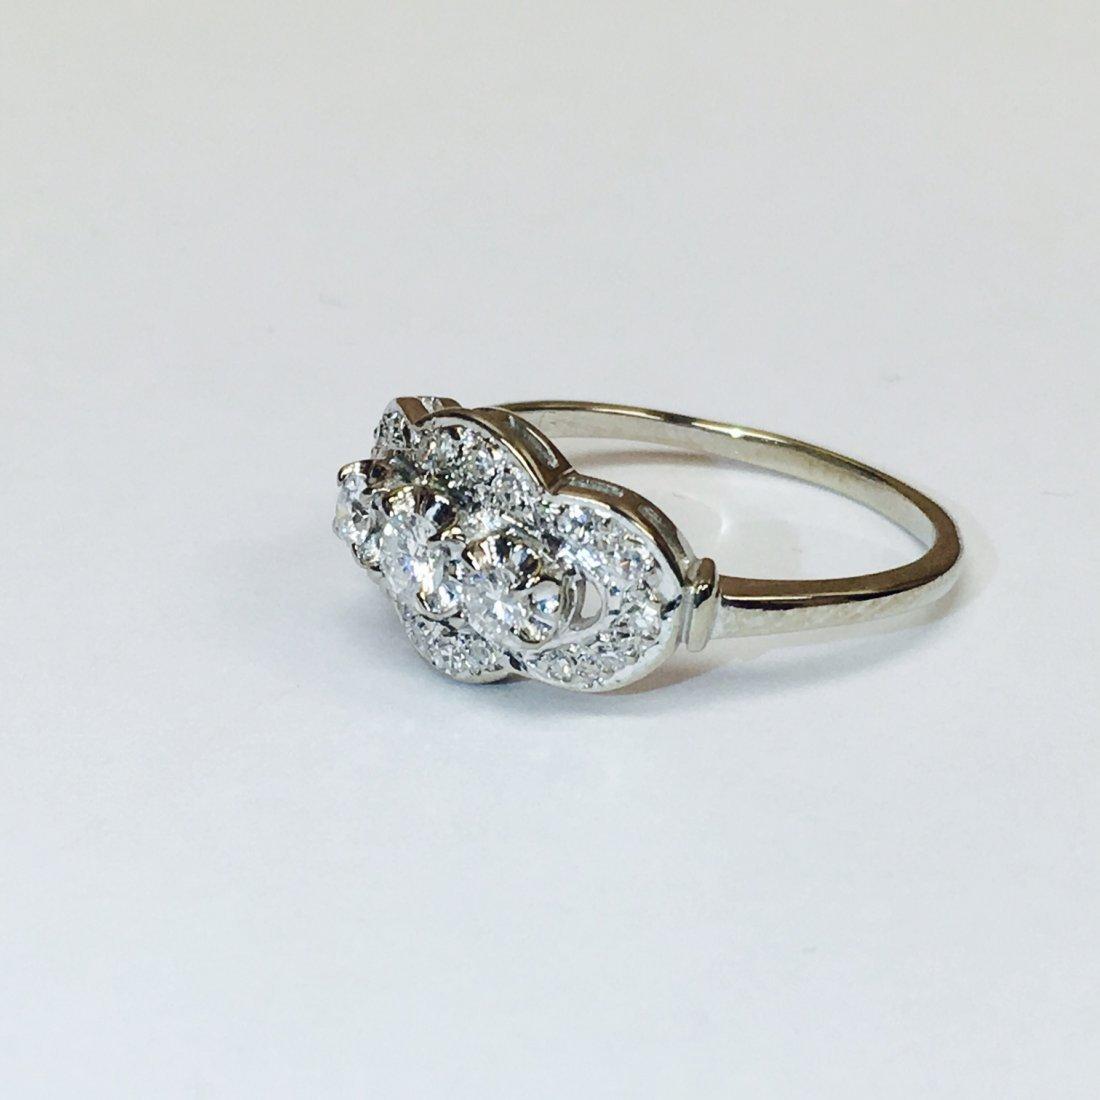 14K White Gold, Antique 1.00 Carat Diamond Ring - 2